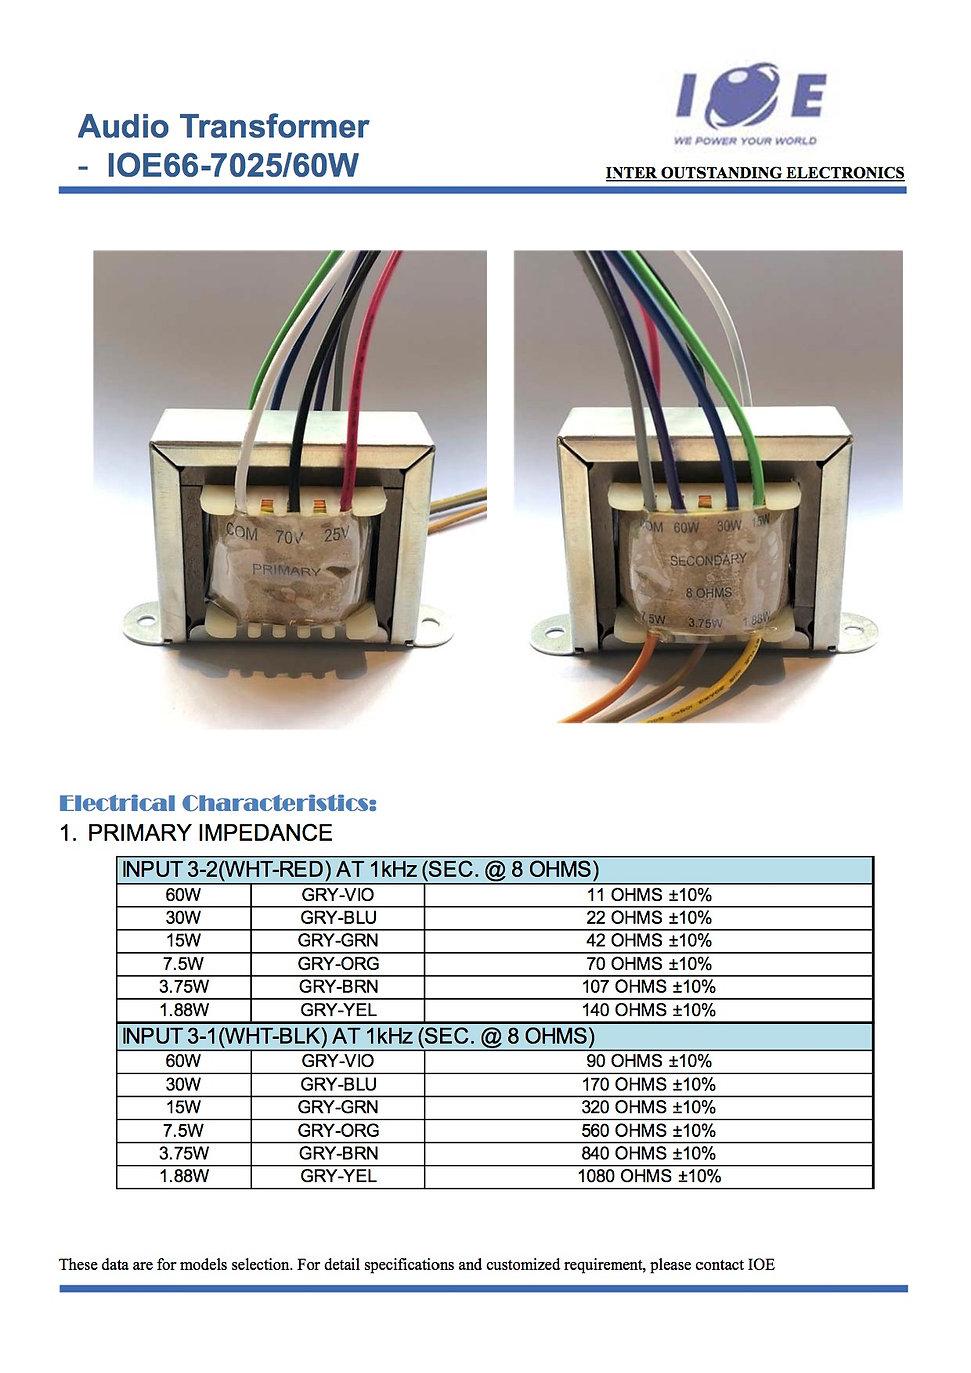 Audio Transformer_IOE66-7025-60W.jpg